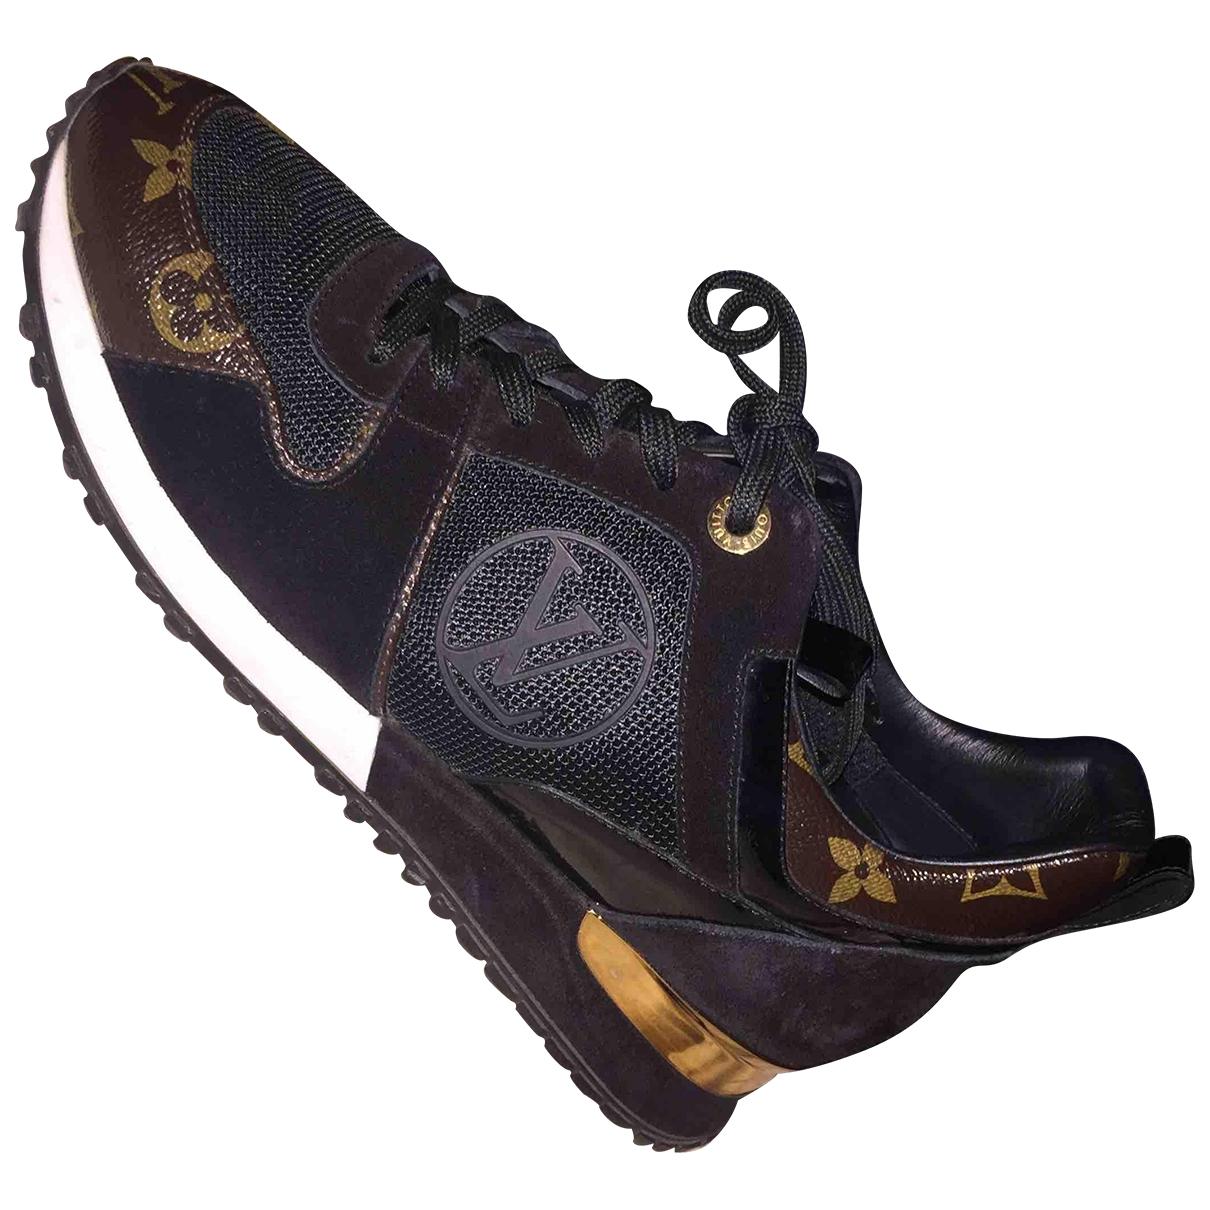 Louis Vuitton Run Away Sneakers in  Braun Lackleder